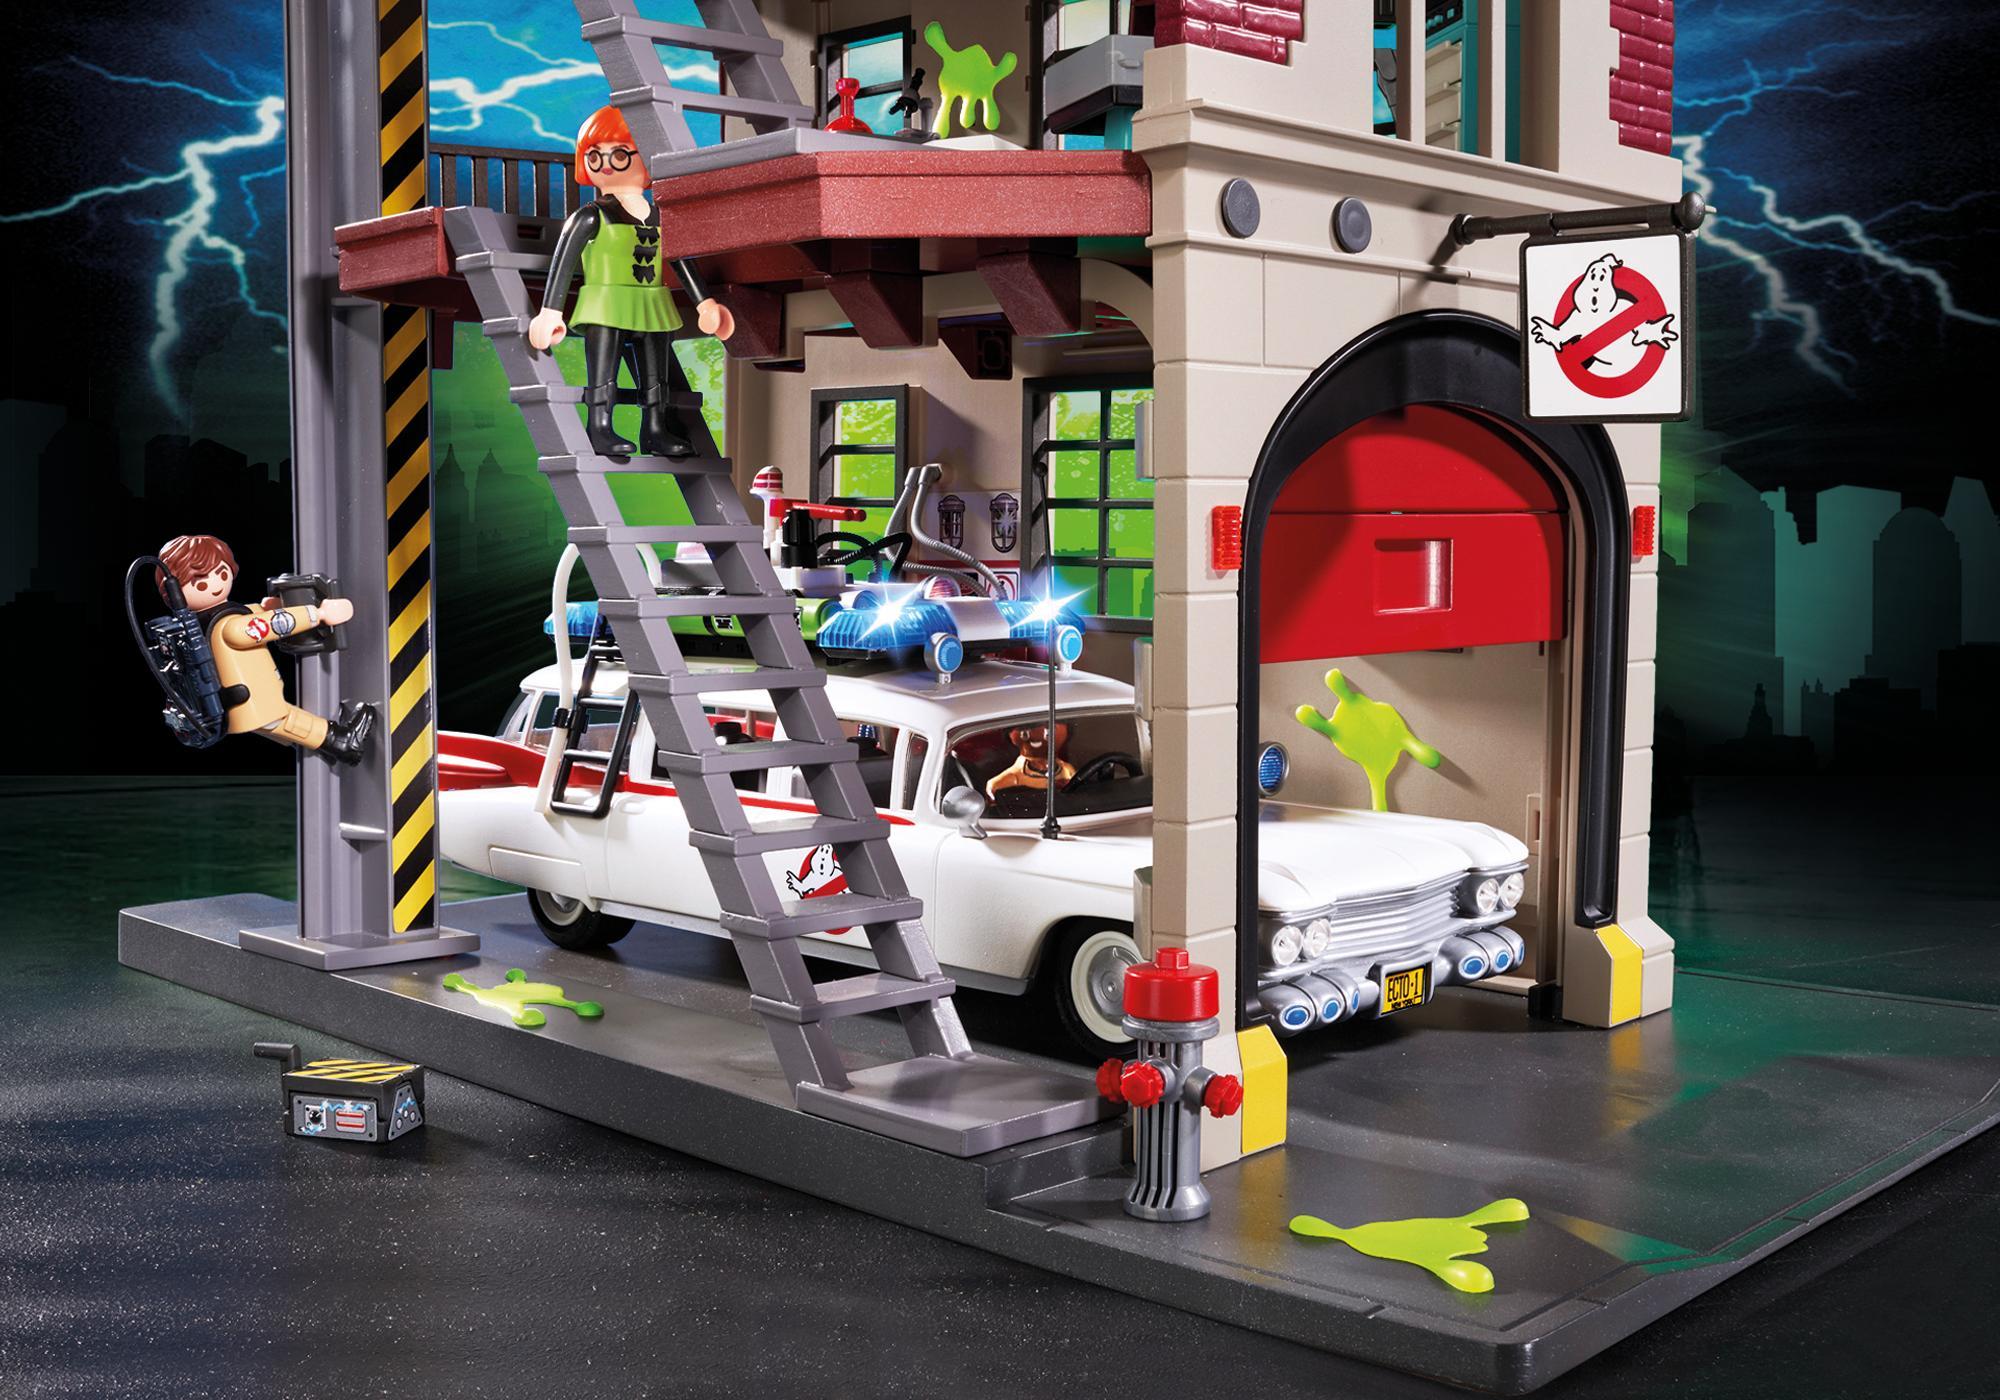 http://media.playmobil.com/i/playmobil/9219_product_extra2/Ghostbusters™ brandstation